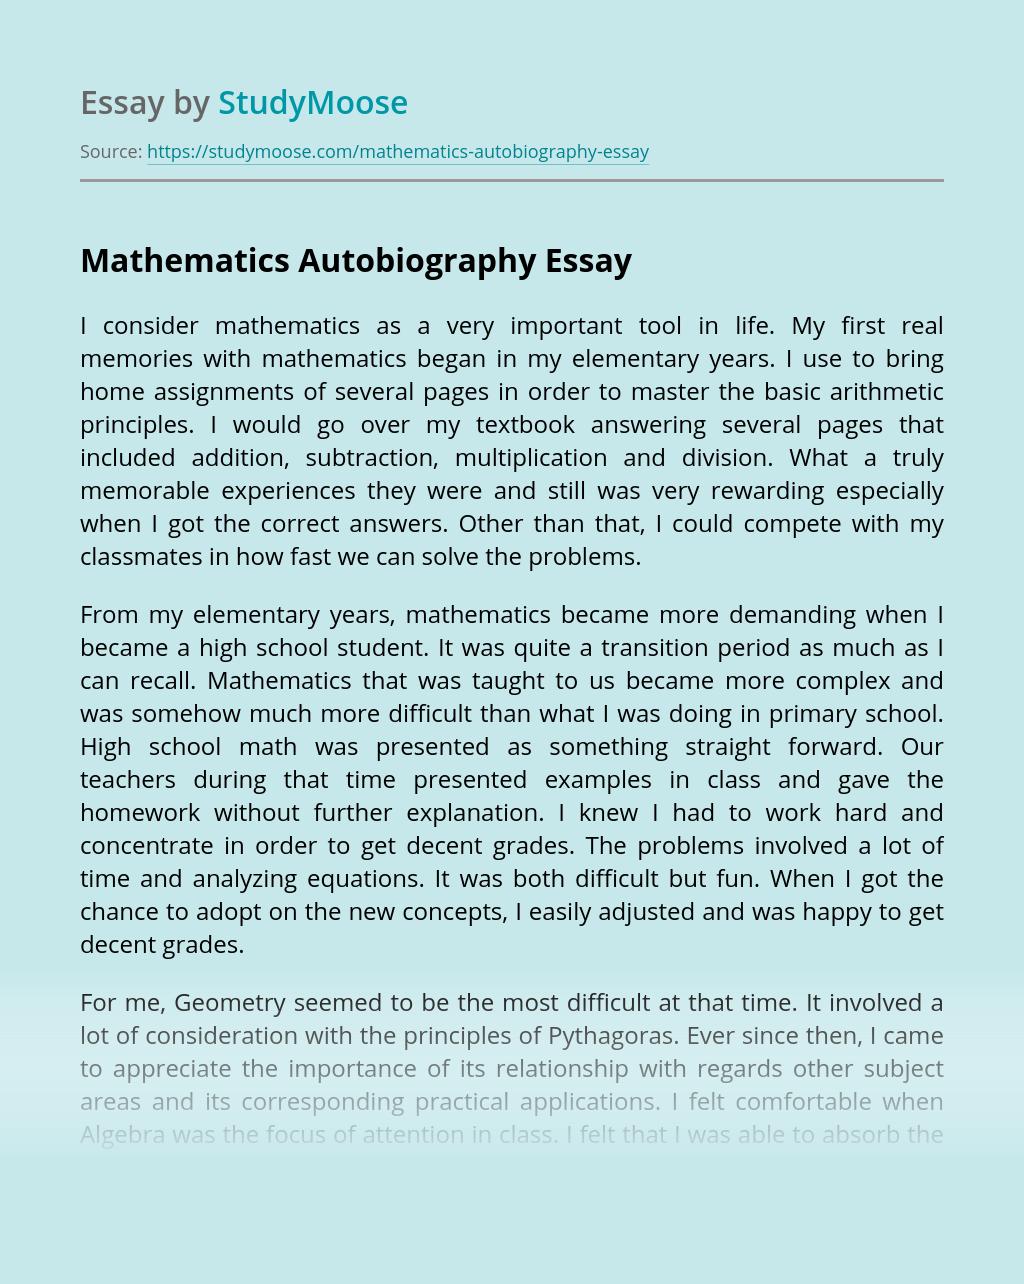 Mathematics Autobiography